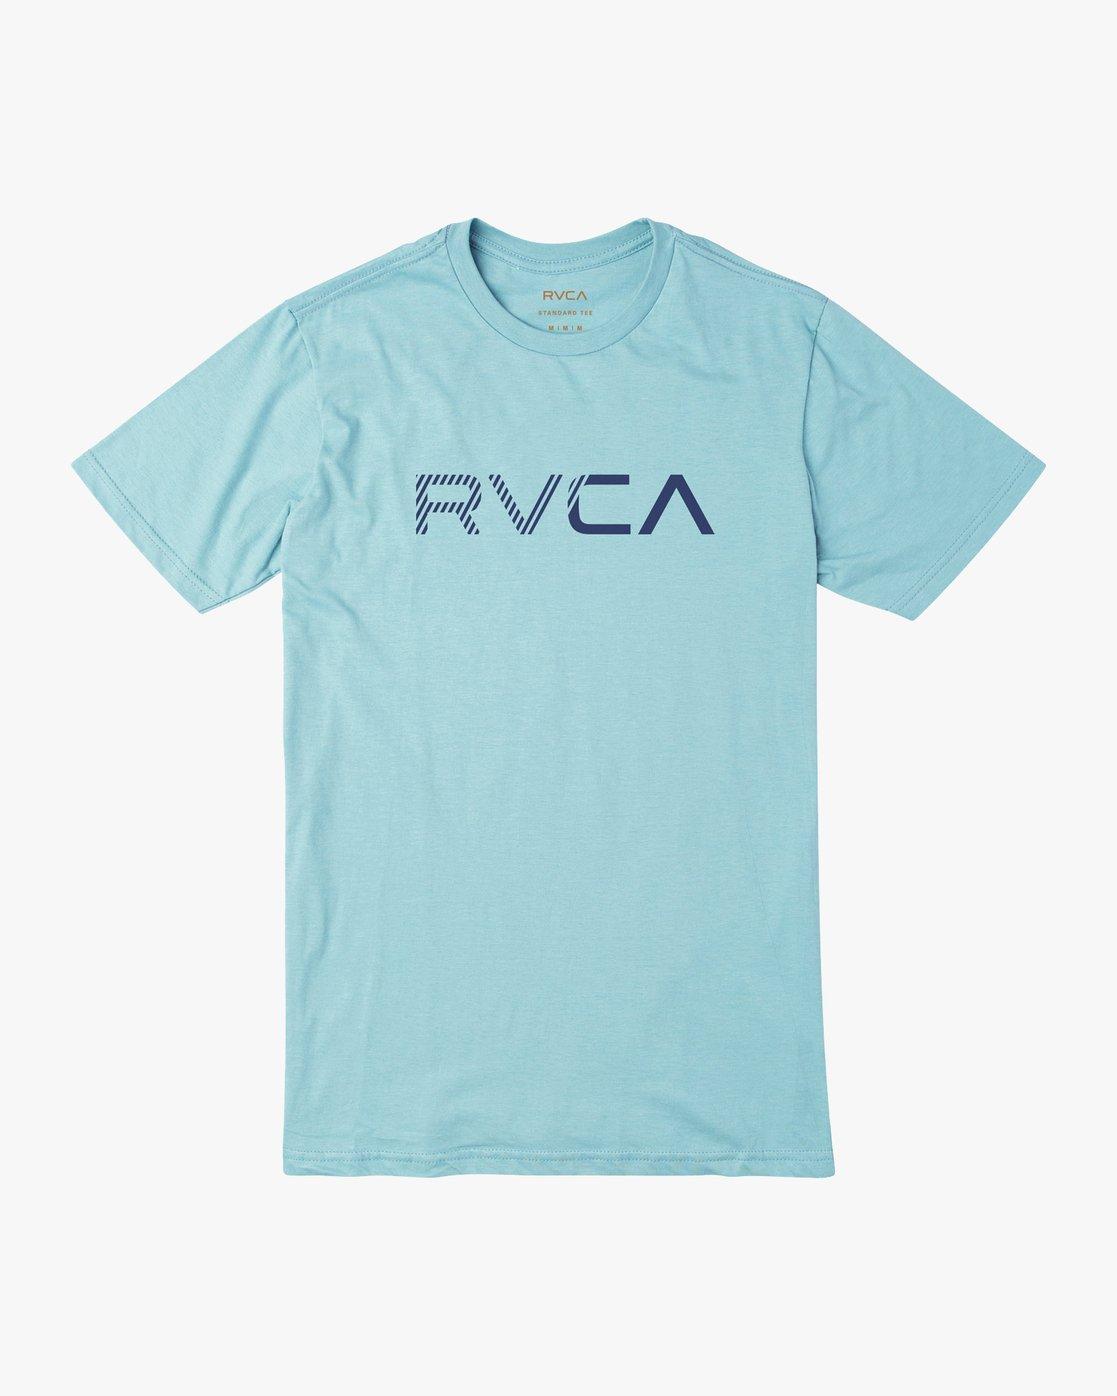 0 Blinded T-Shirt Blue M401TRBL RVCA